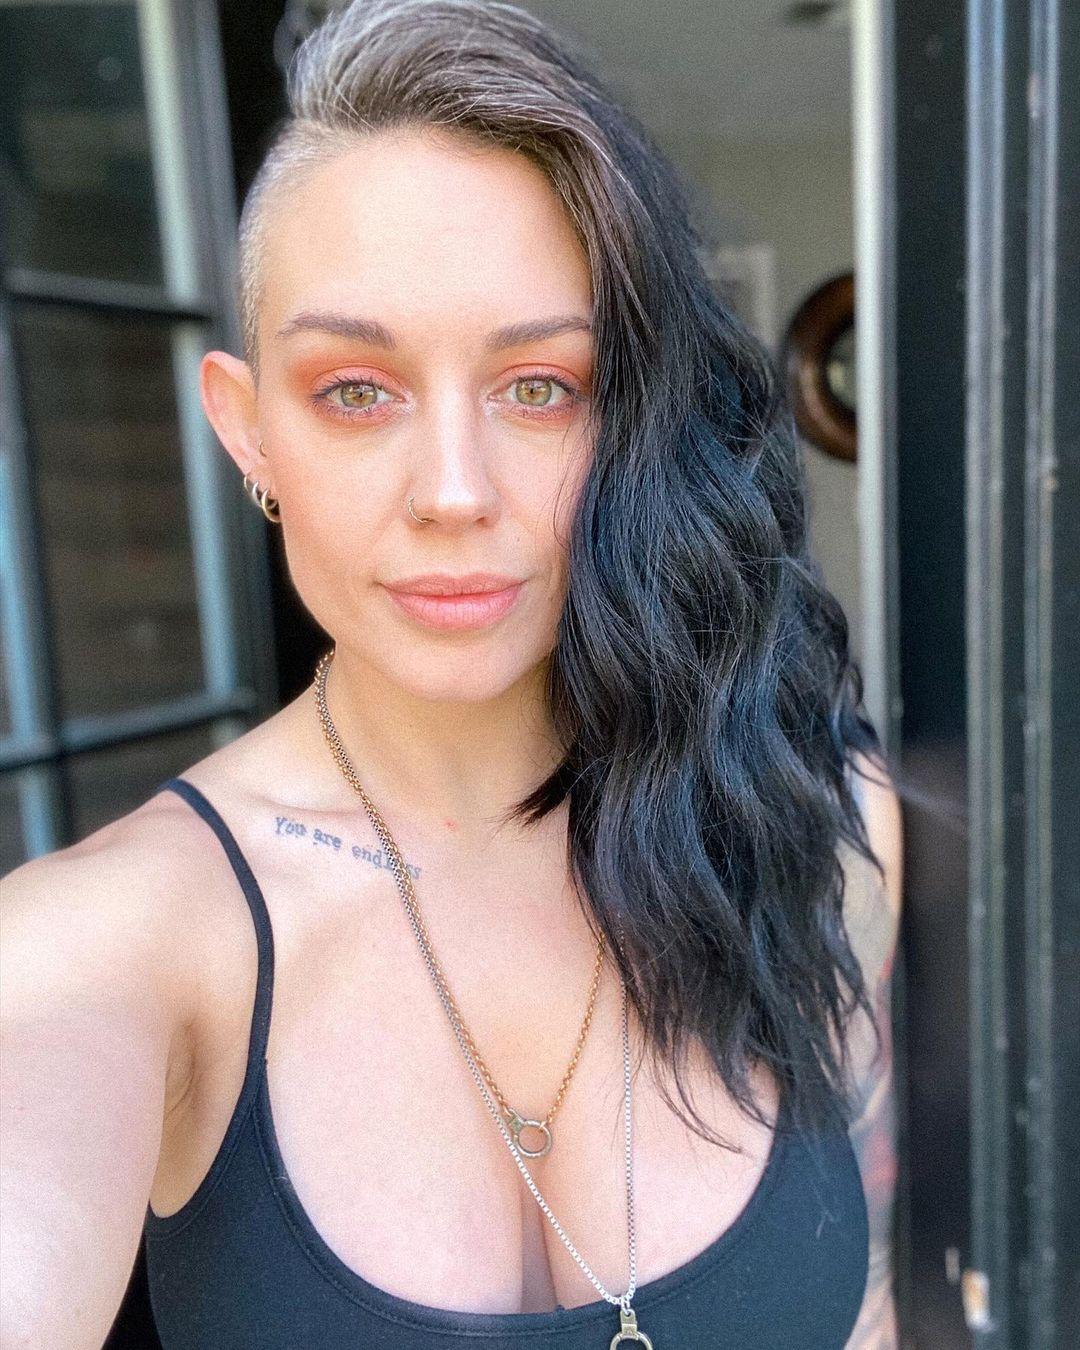 Celeste Bonin Nude Leaked The Fappening & Sexy 0062